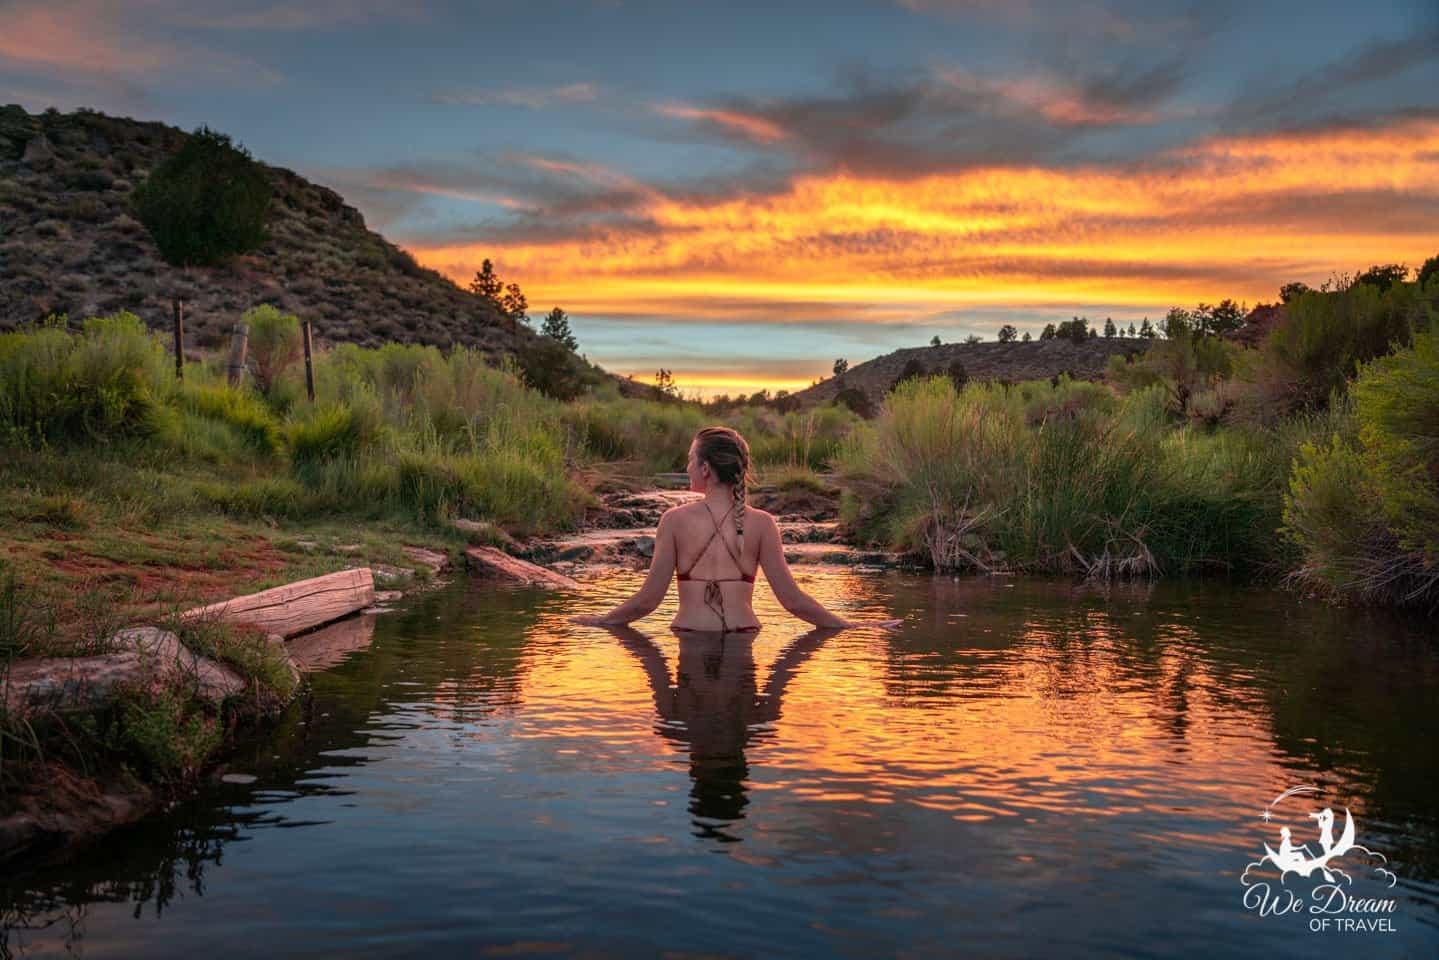 Fiery sunset from Little Hot Creek near Mammoth Hot Springs.